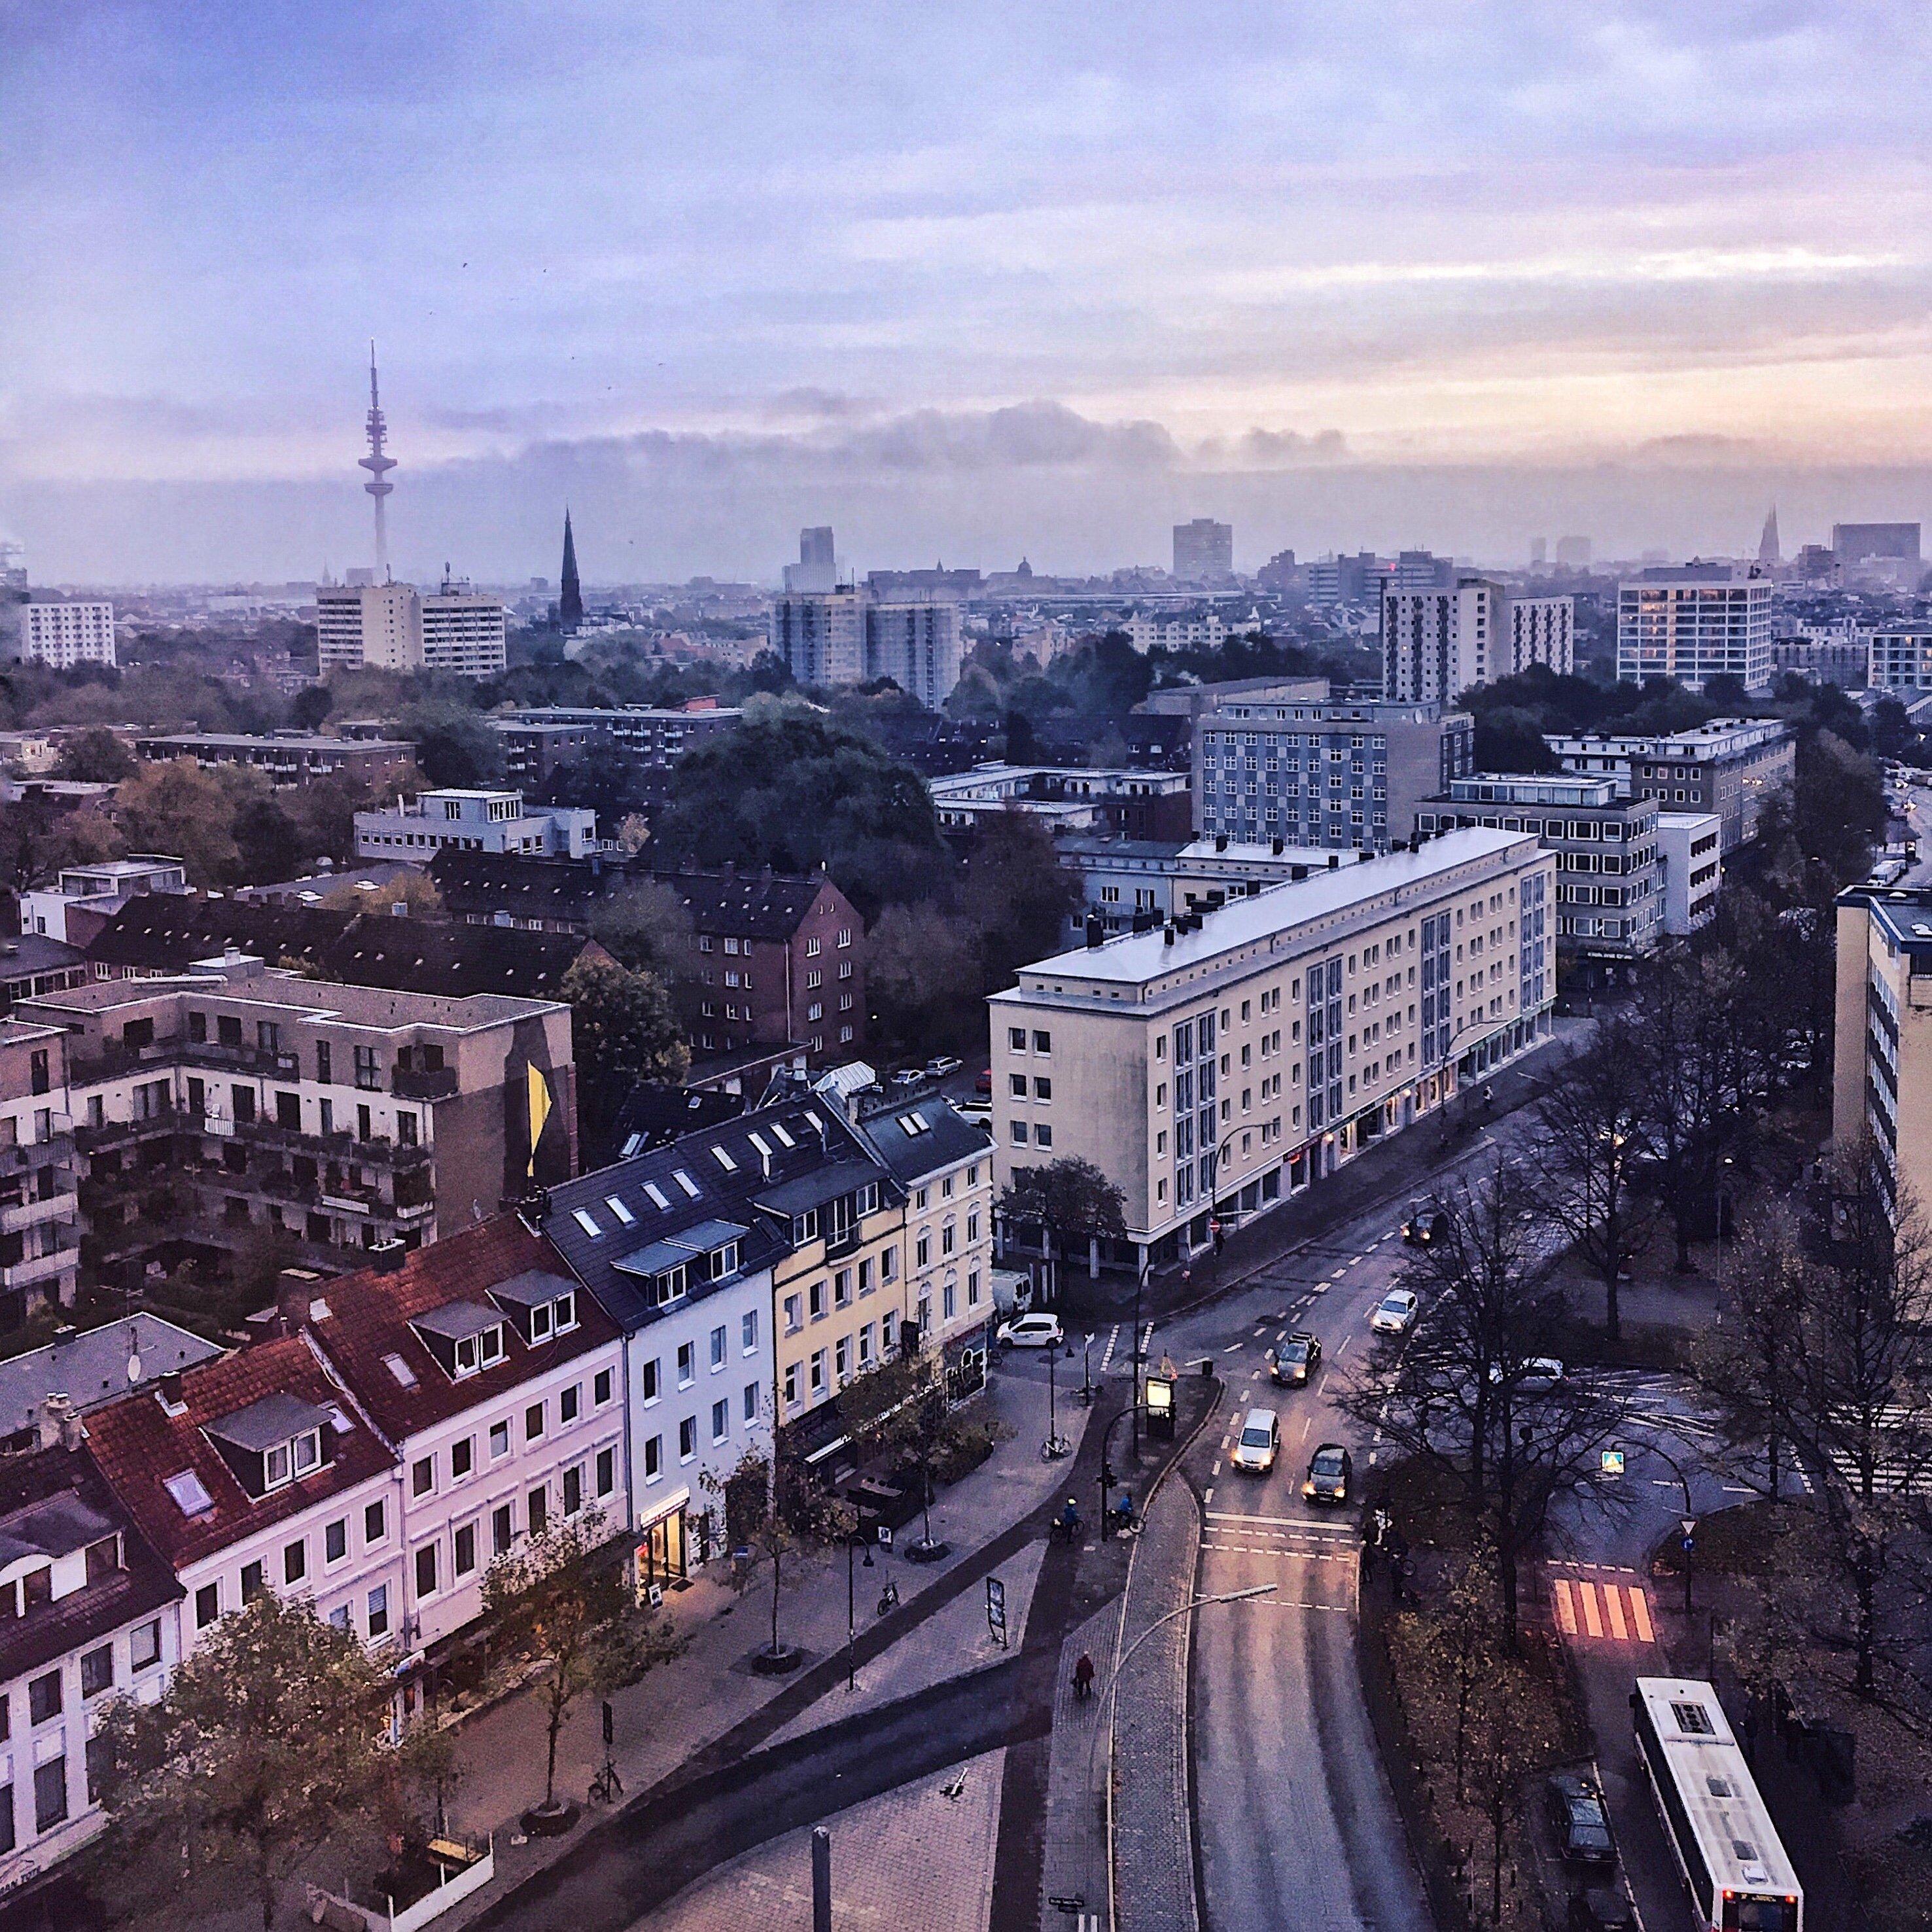 Keane, Tocotronic, Édith Piaf: My Huge List Of Hamburg Songs